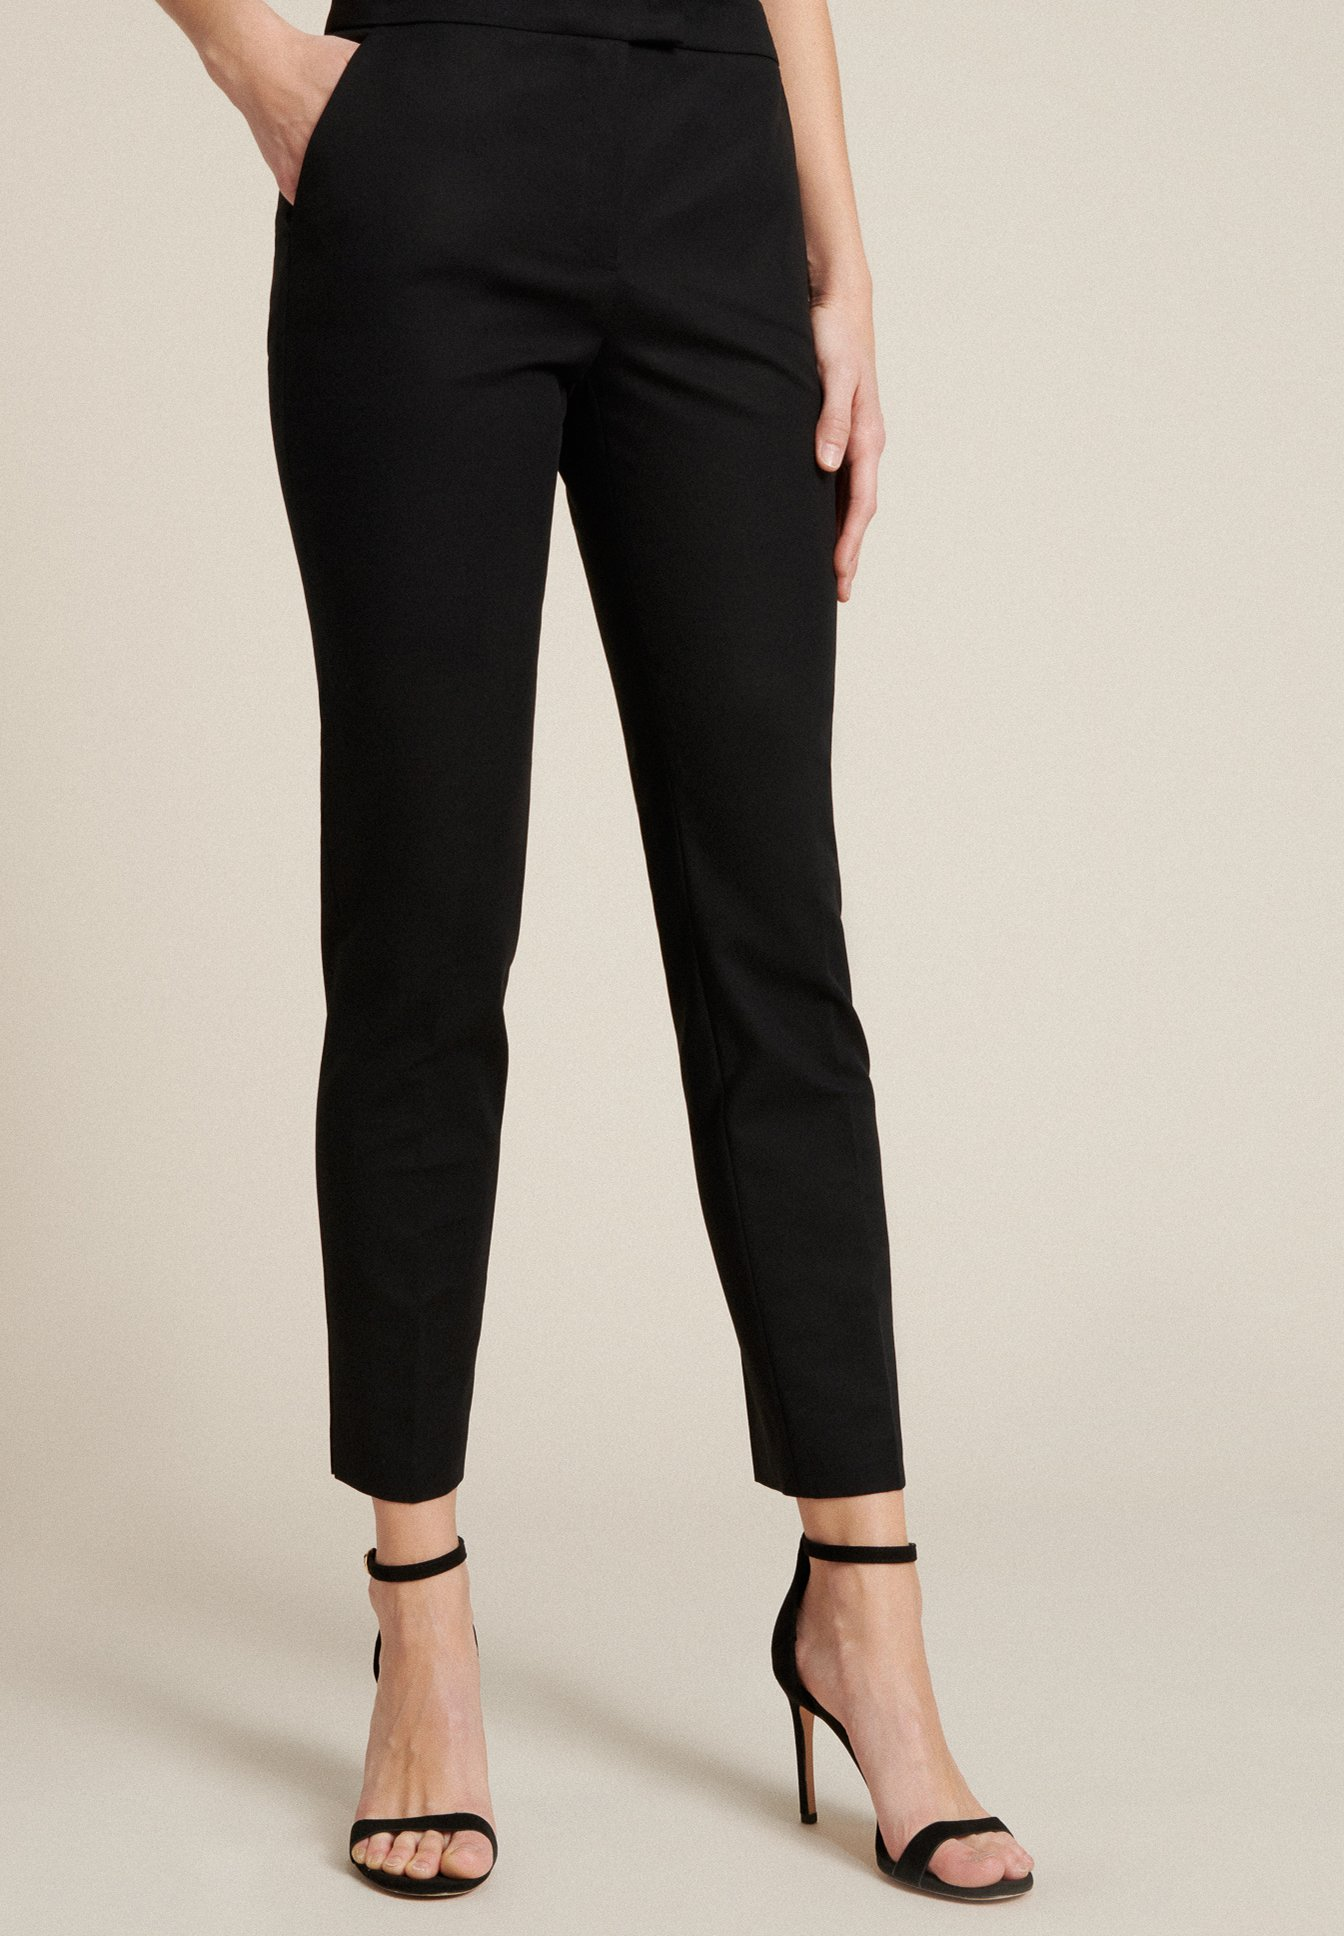 Damen ACUTO - Leggings - Hosen